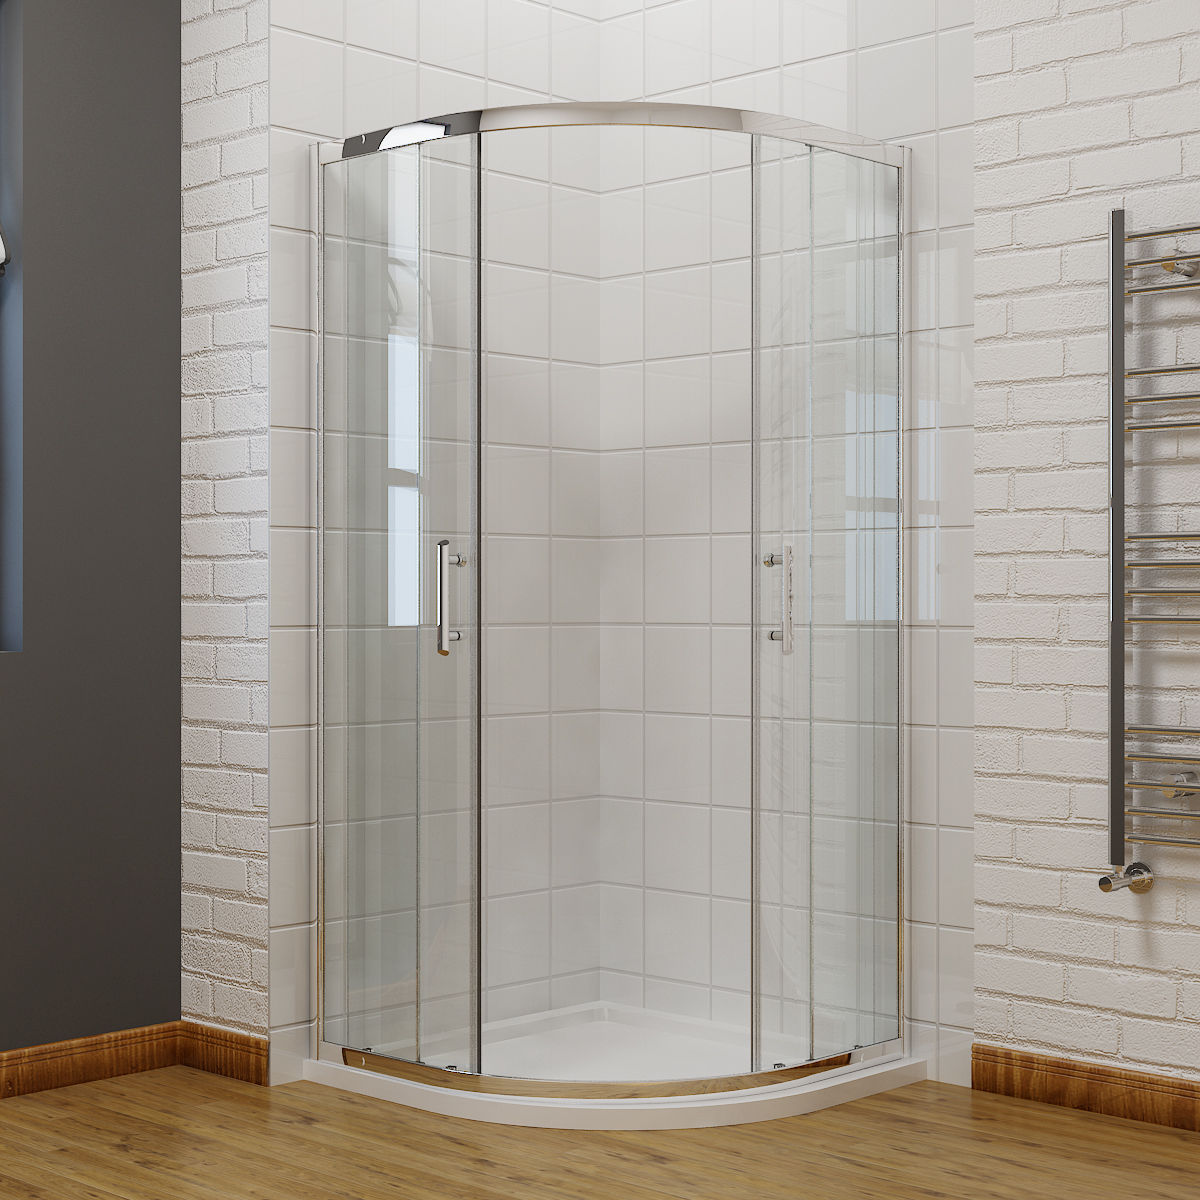 New 35 4 x35 4 neo round frameless sliding shower enclosure chrome promotion ebay - Corner shower doors ...